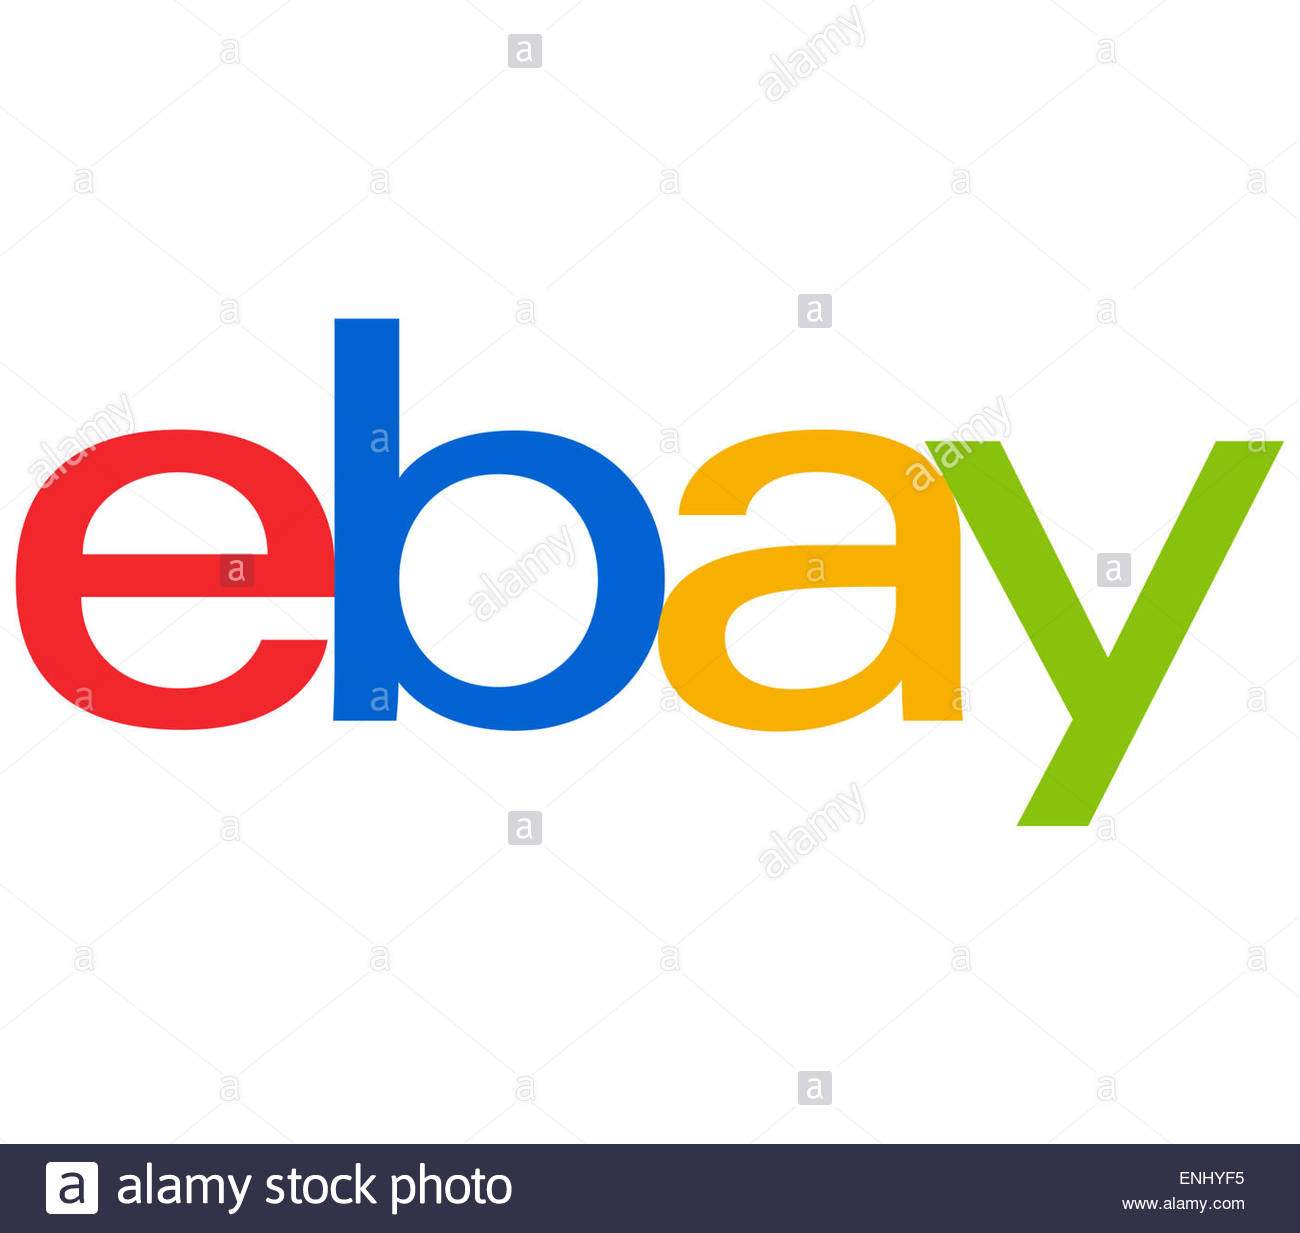 Ebay Logo Stock Photos Ebay Logo Stock Images Alamy